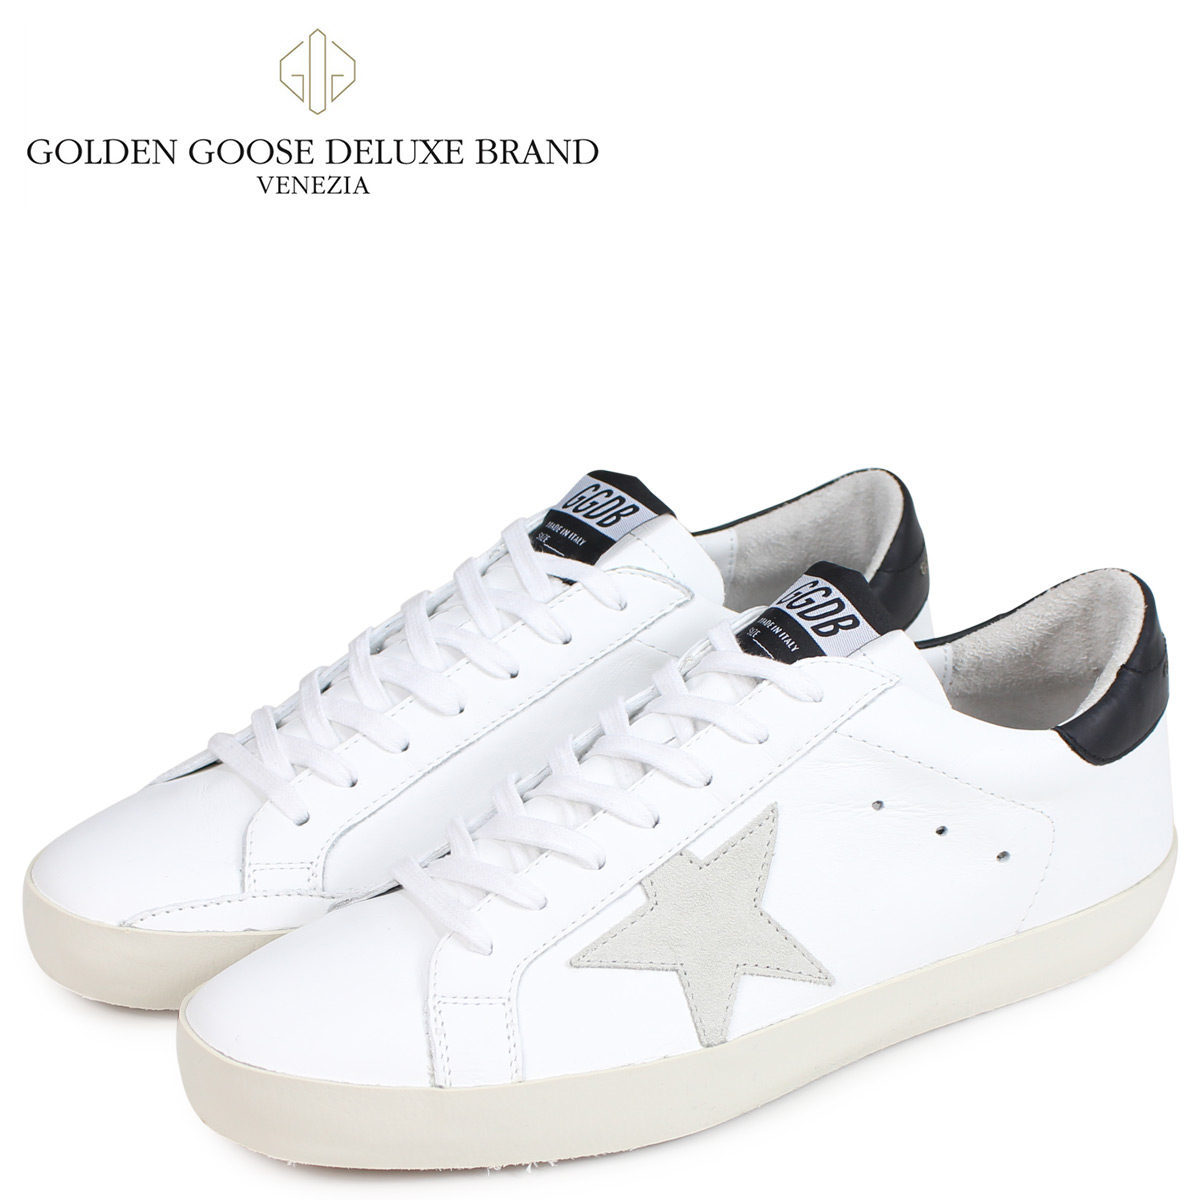 Golden Goose ゴールデングース スニーカー メンズ スーパースター SNEAKERS SUPERSTAR ホワイト 白 G33MS590 E73